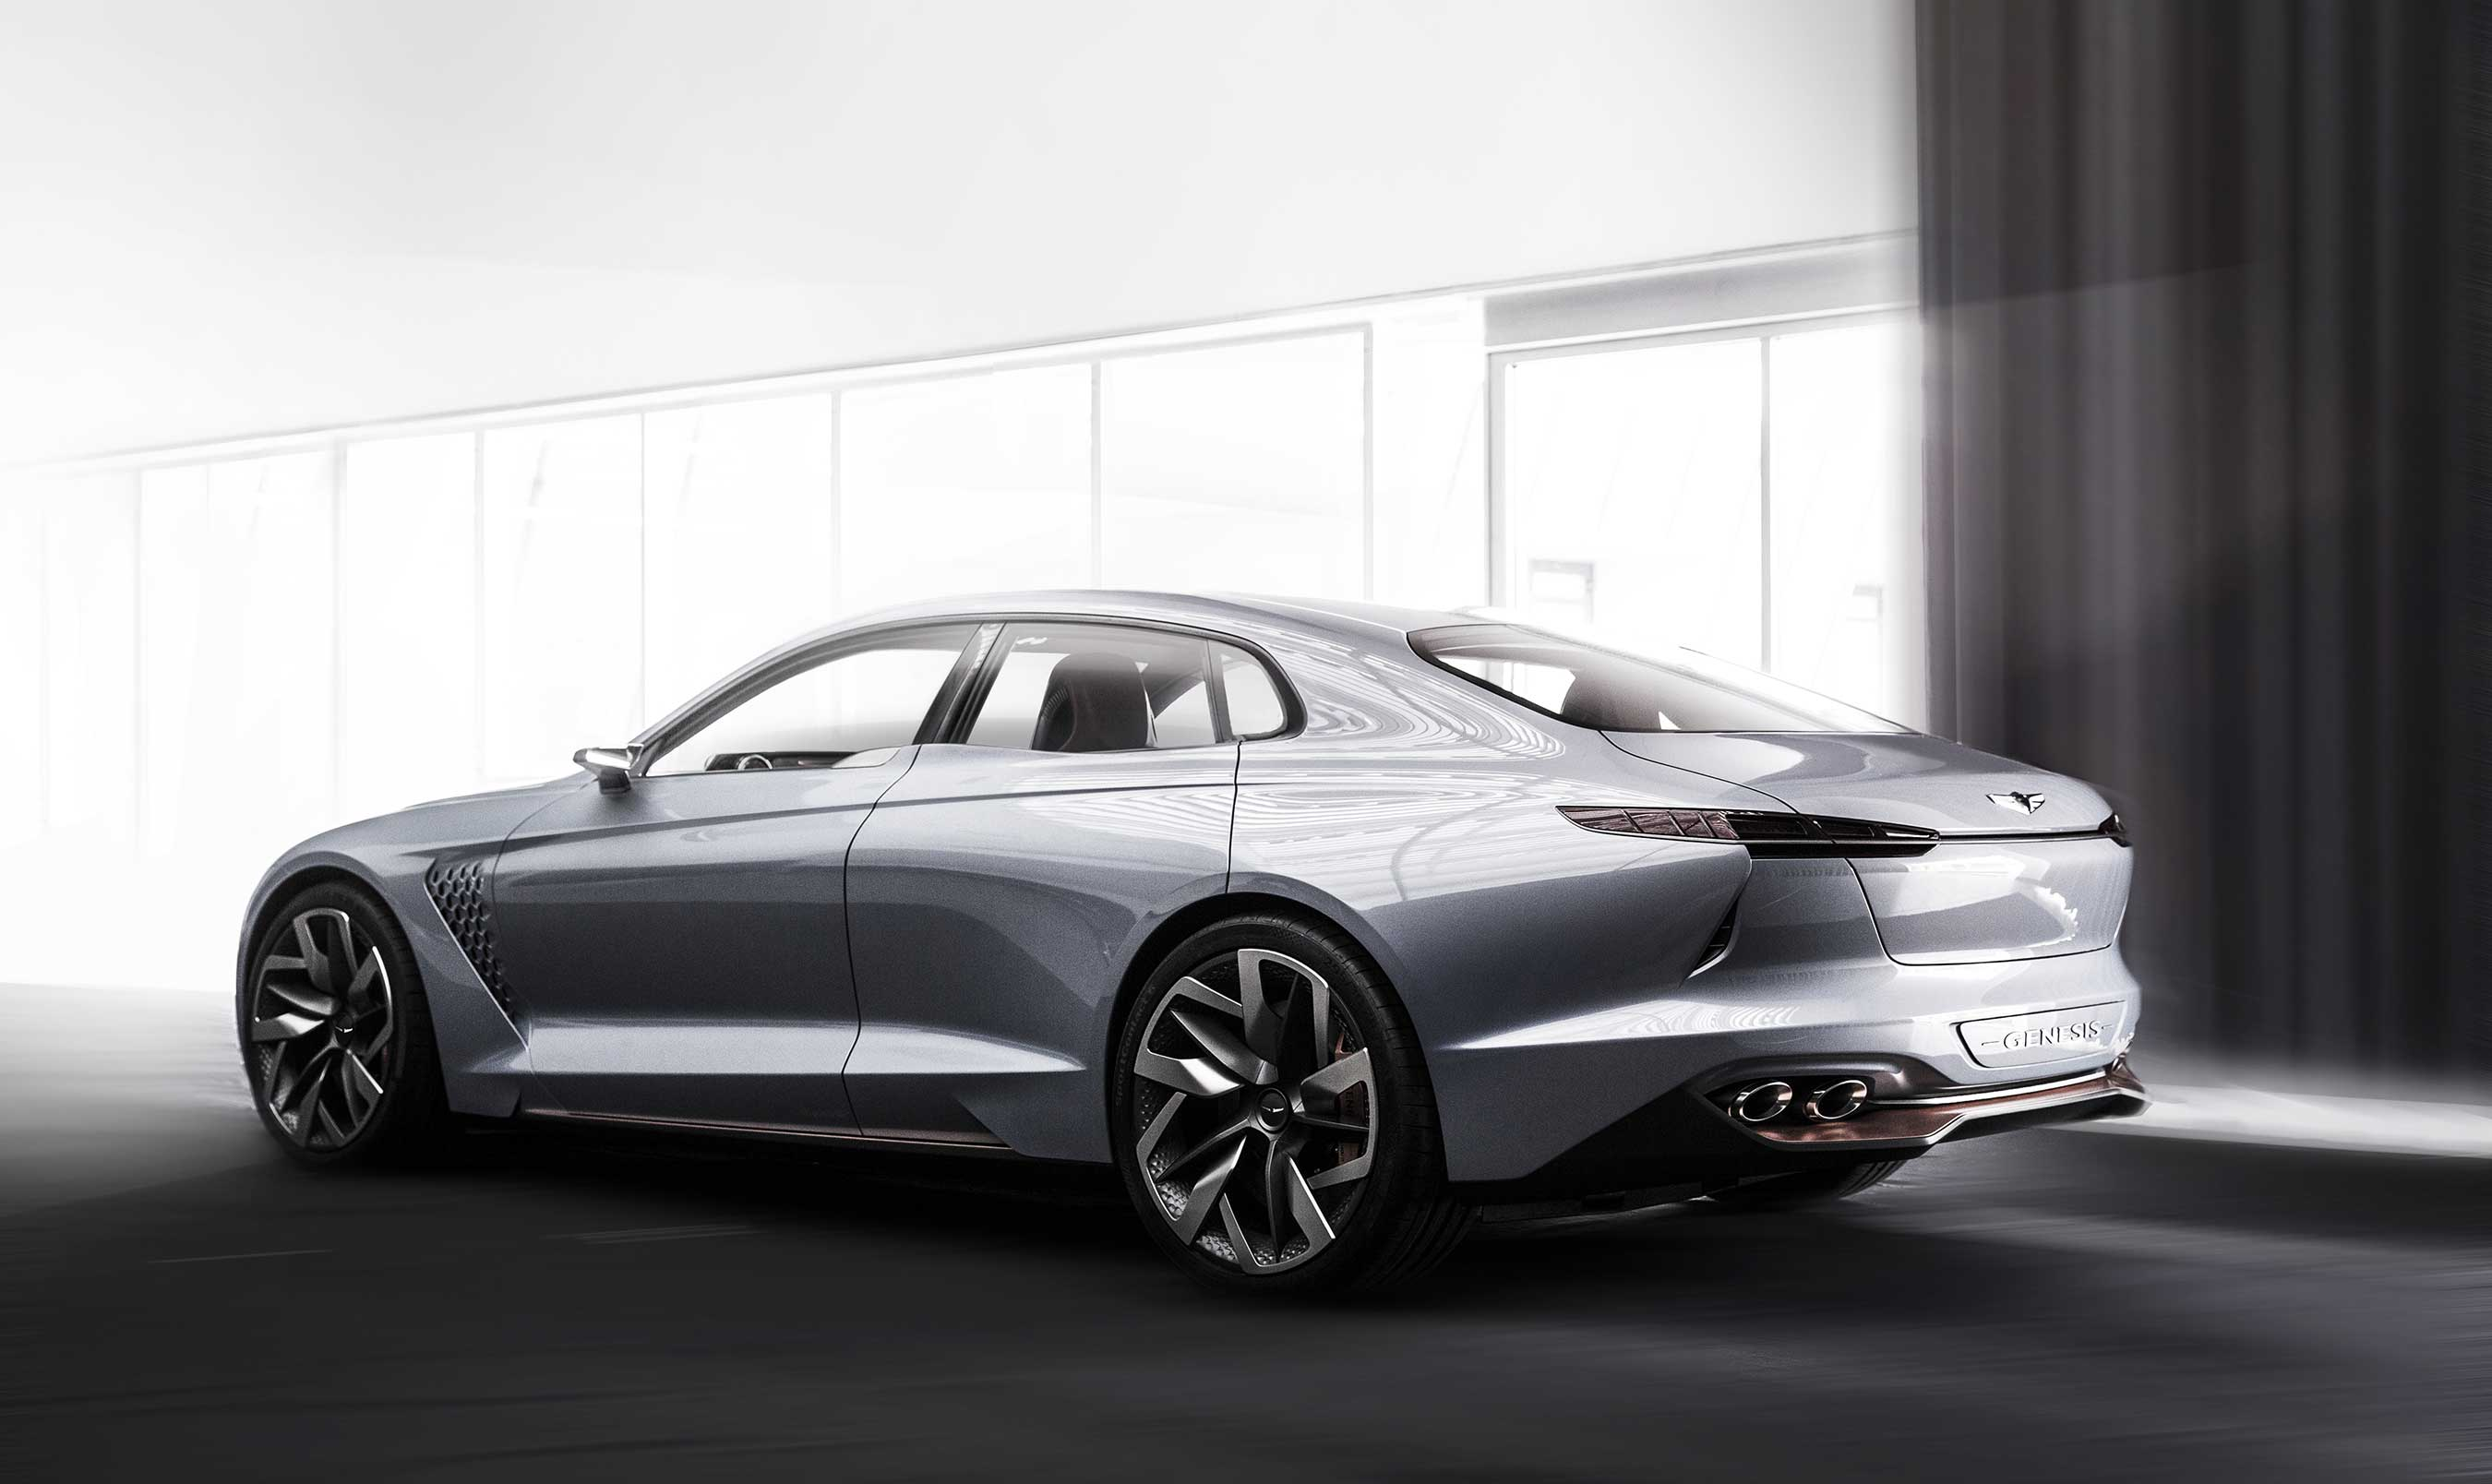 Genesis Reveals Hybrid Sports Sedan Concept At New York International Auto Show